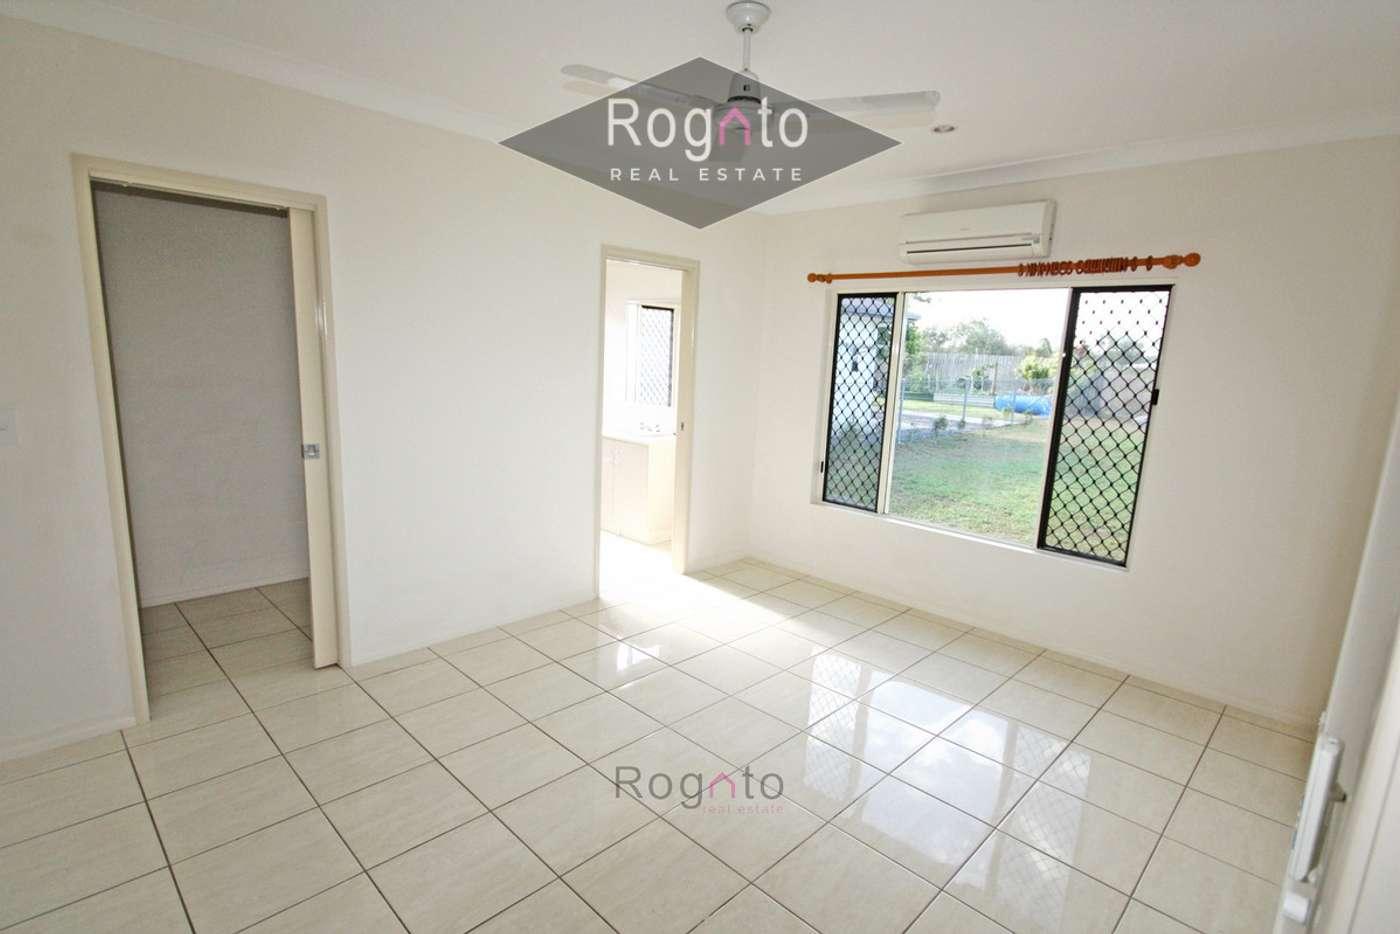 Sixth view of Homely house listing, 38 Jacana Close, Mareeba QLD 4880